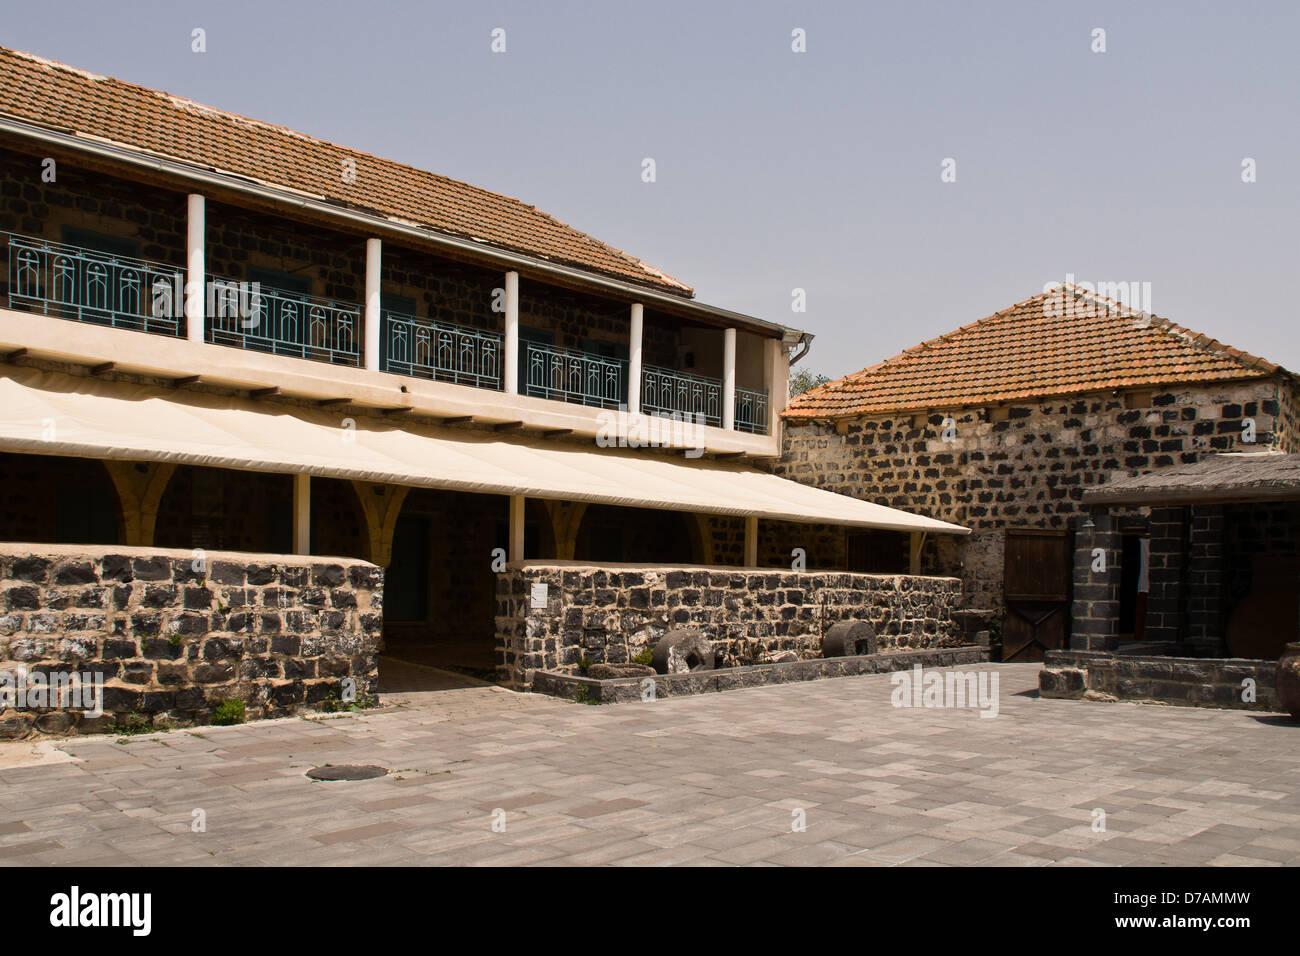 Rechaniya, Israel. 2nd May 2013. The Circassian Heritage Center in Kfar Kama offers a display of traditional Circassian - Stock Image